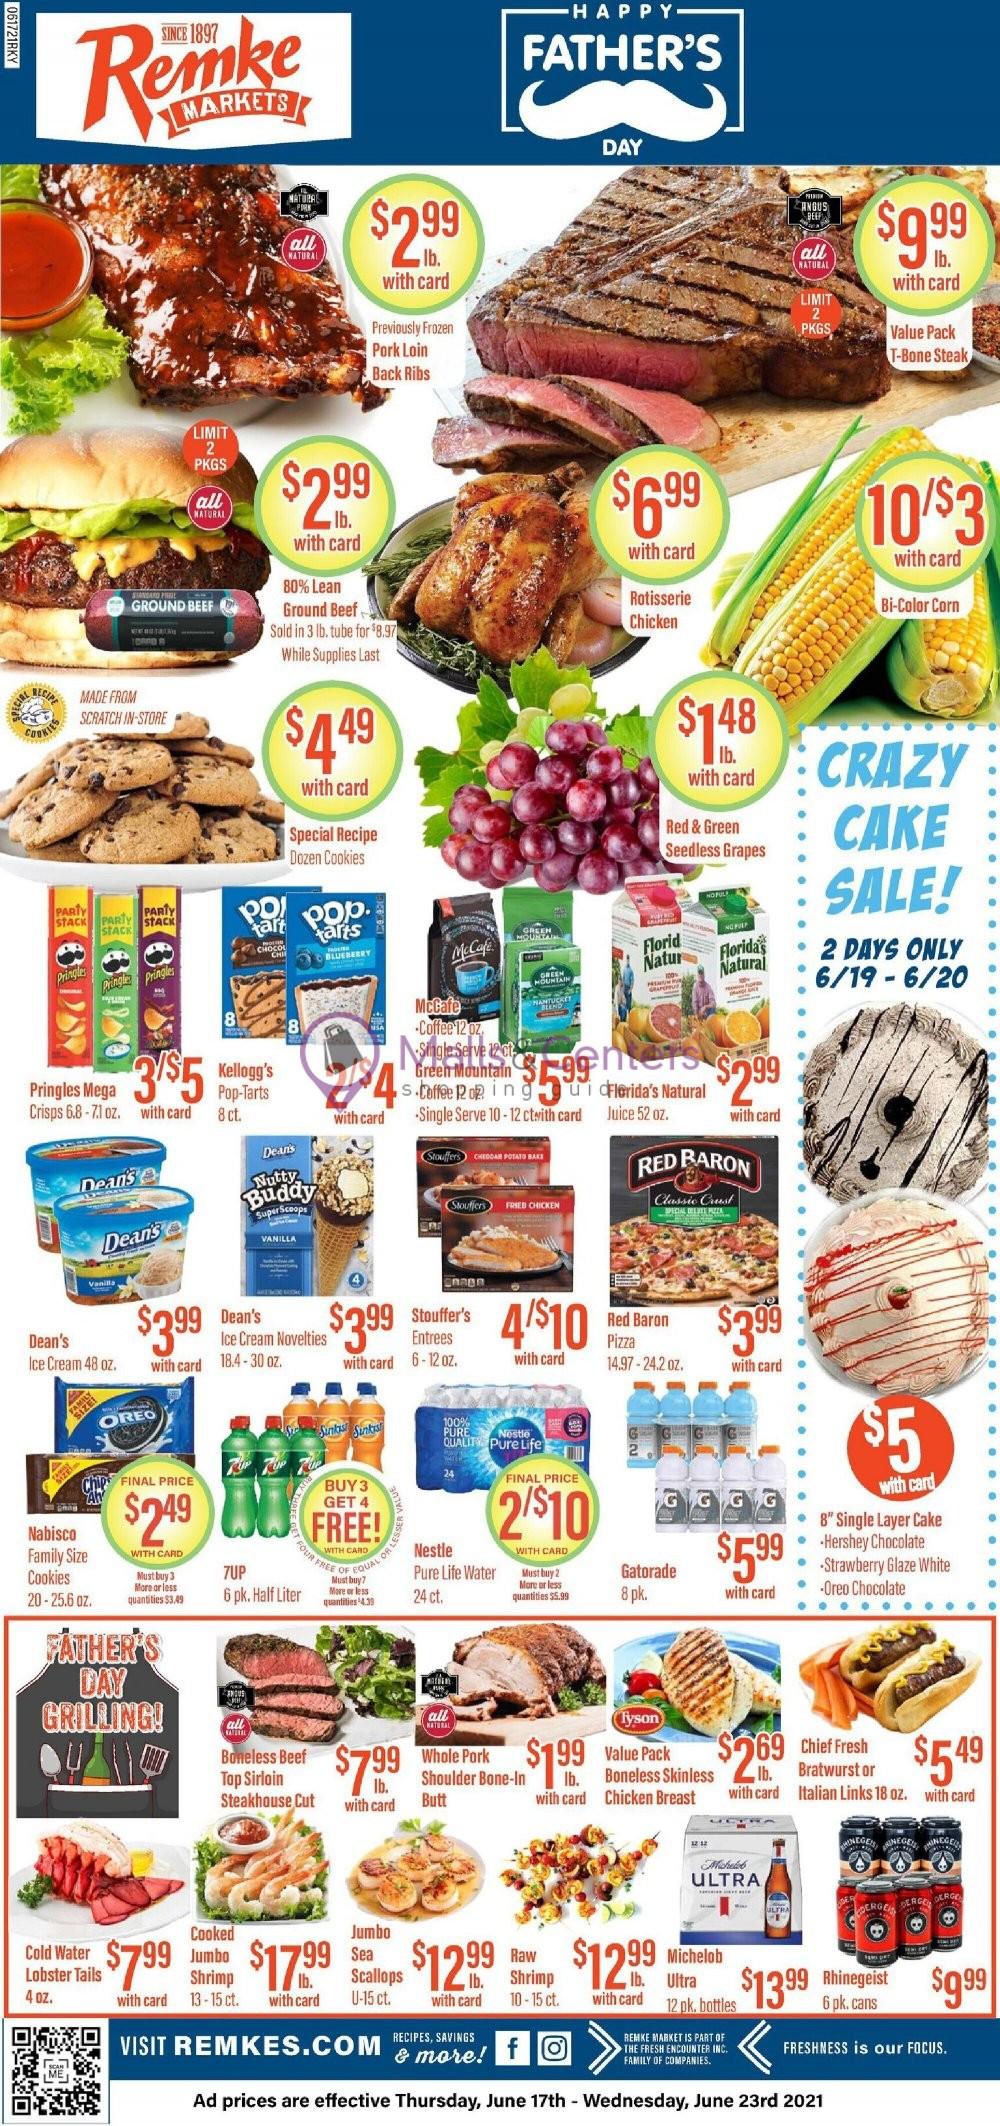 weekly ads Remke Markets - page 1 - mallscenters.com